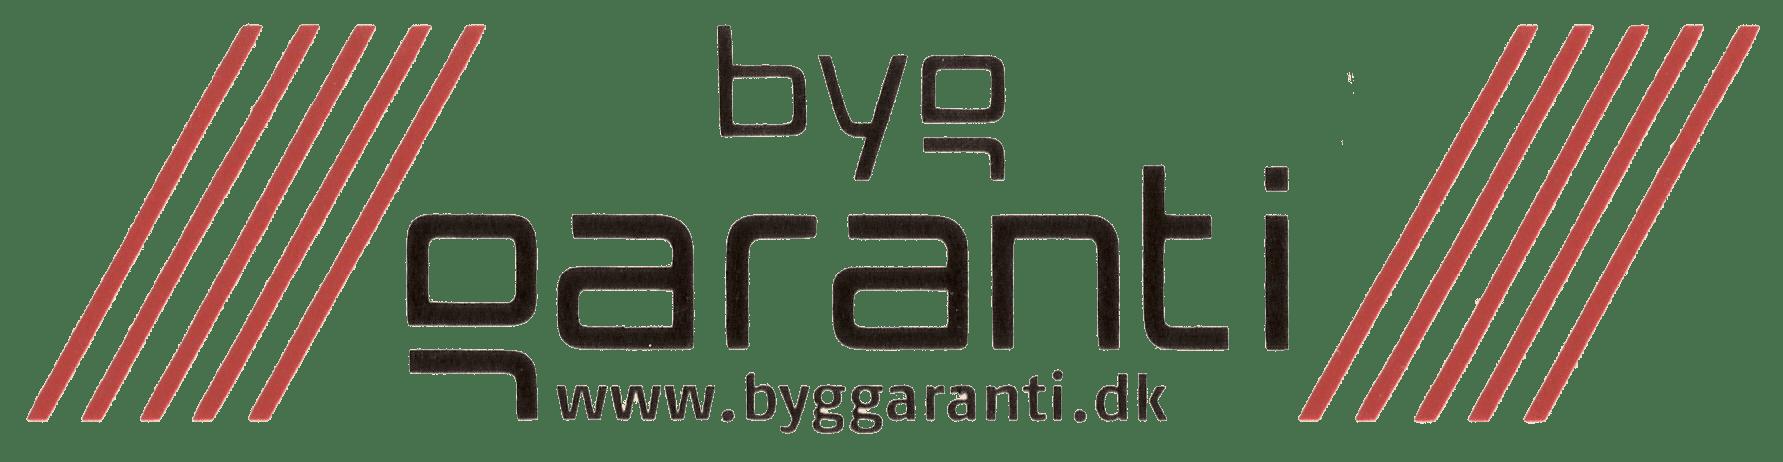 Byg-garanti